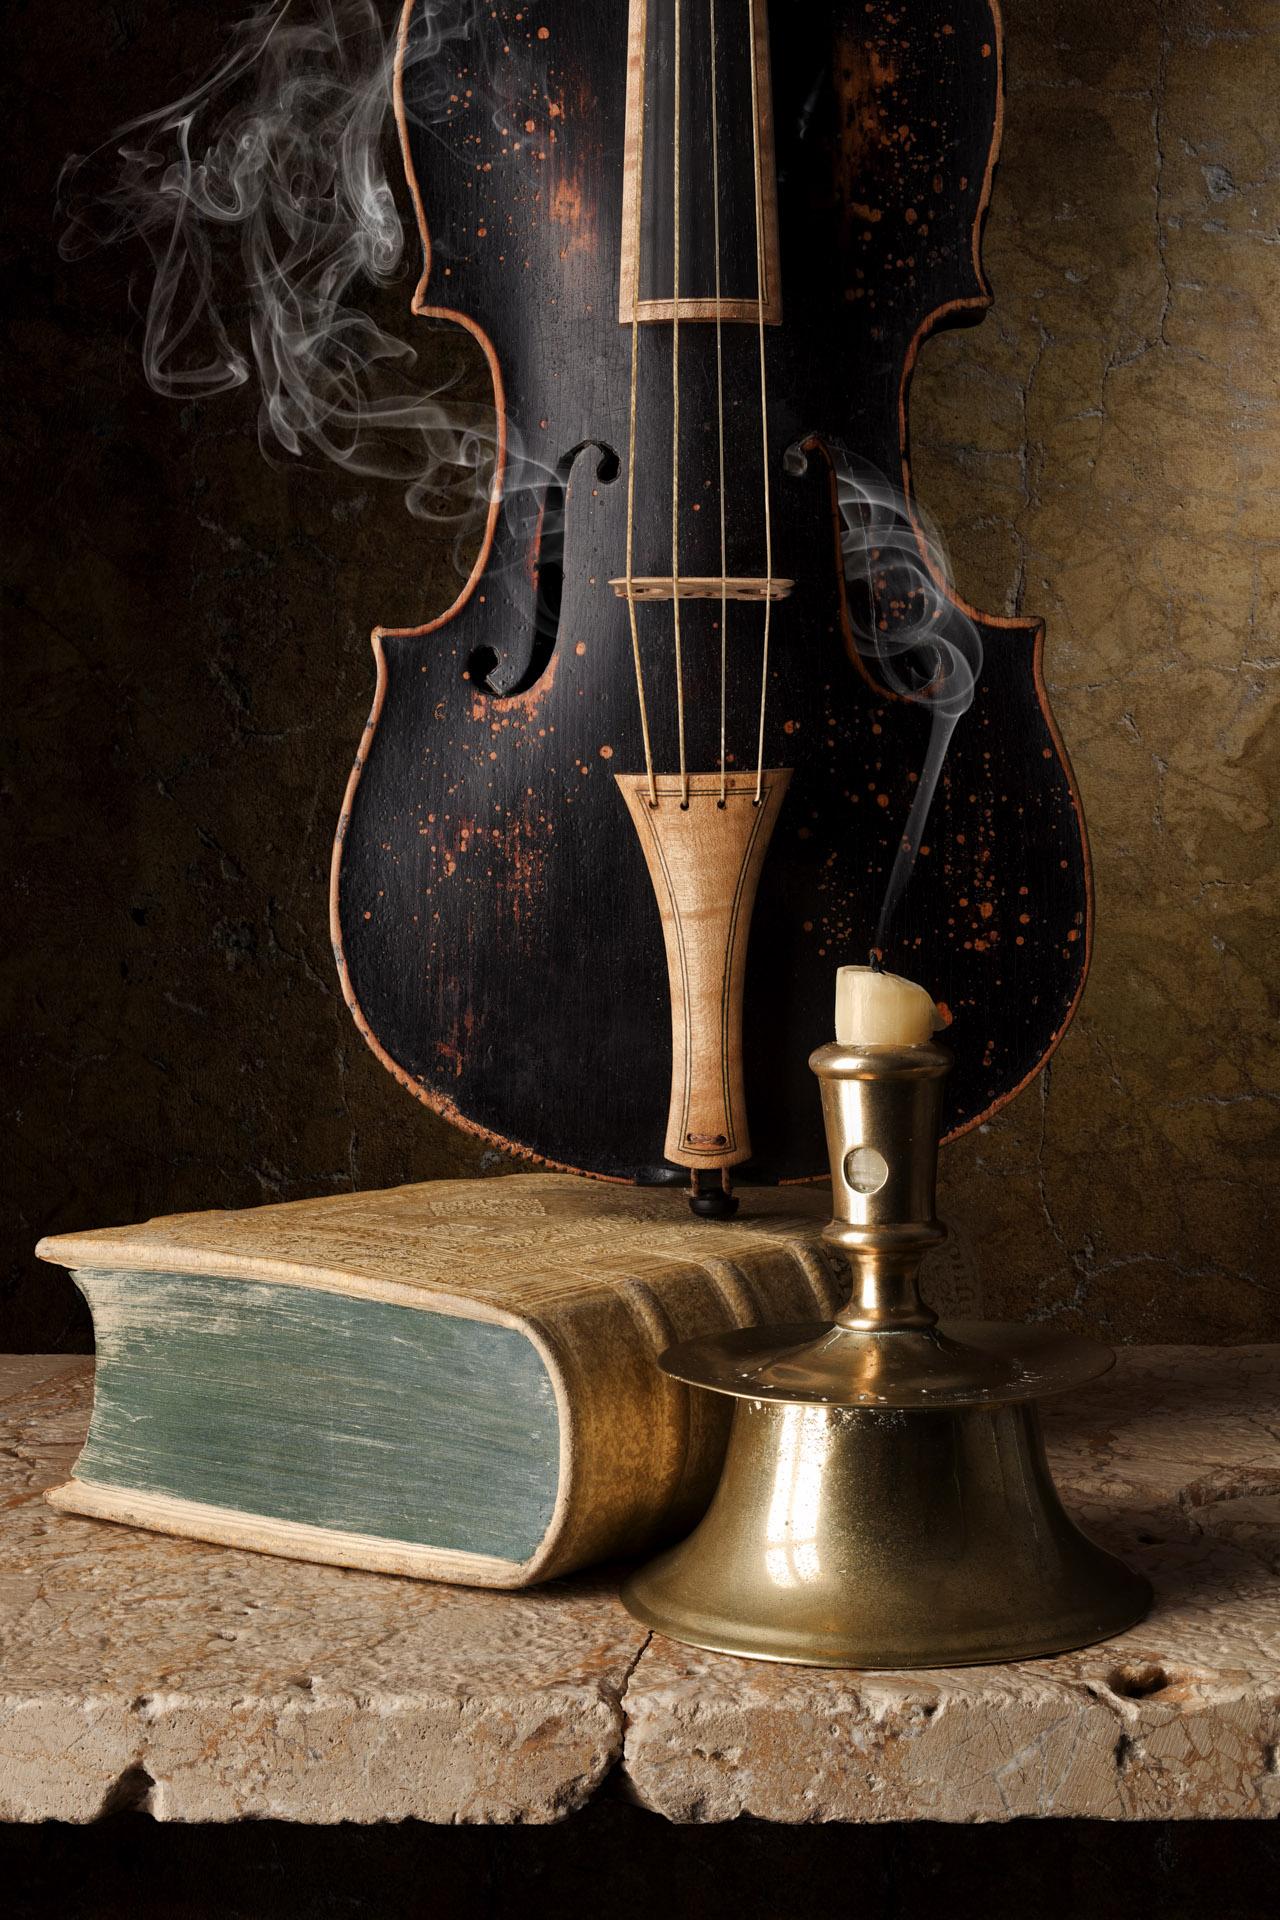 Musical smoke